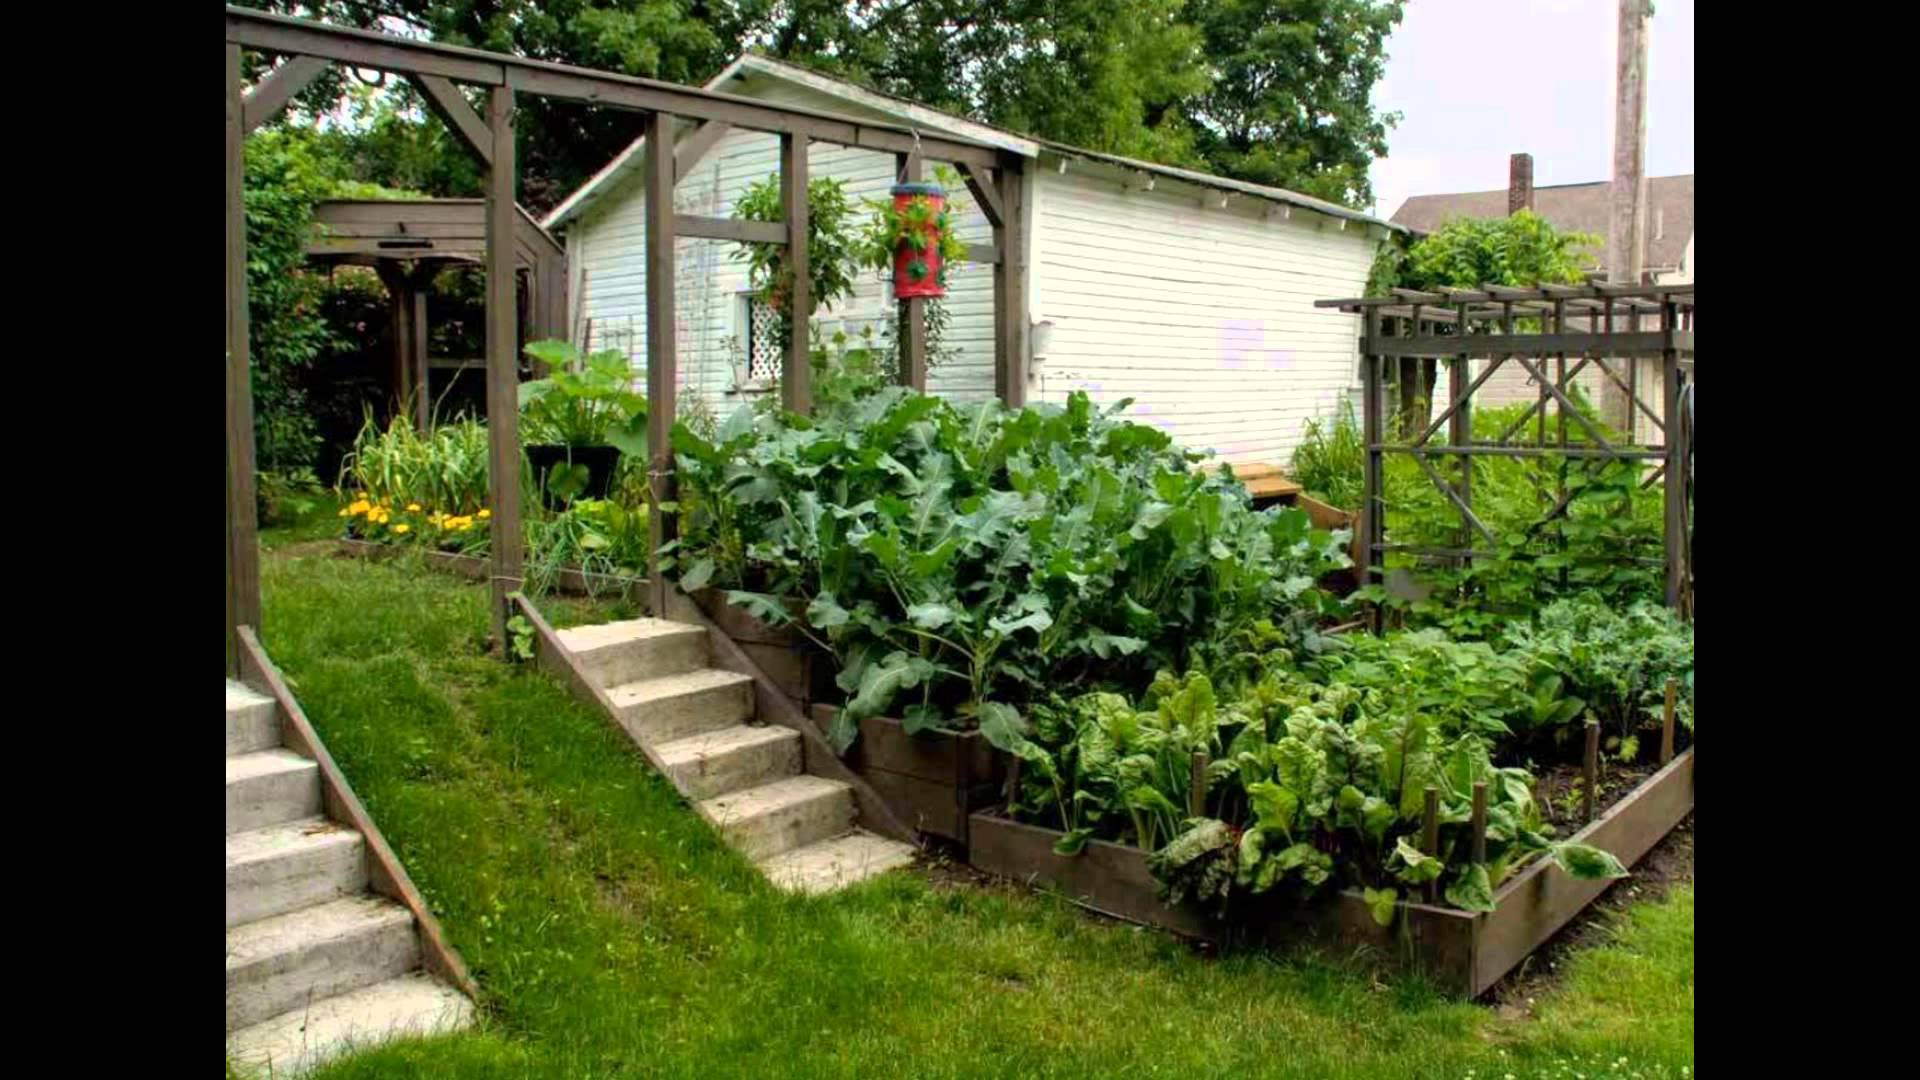 vege garden design ideas photo - 10